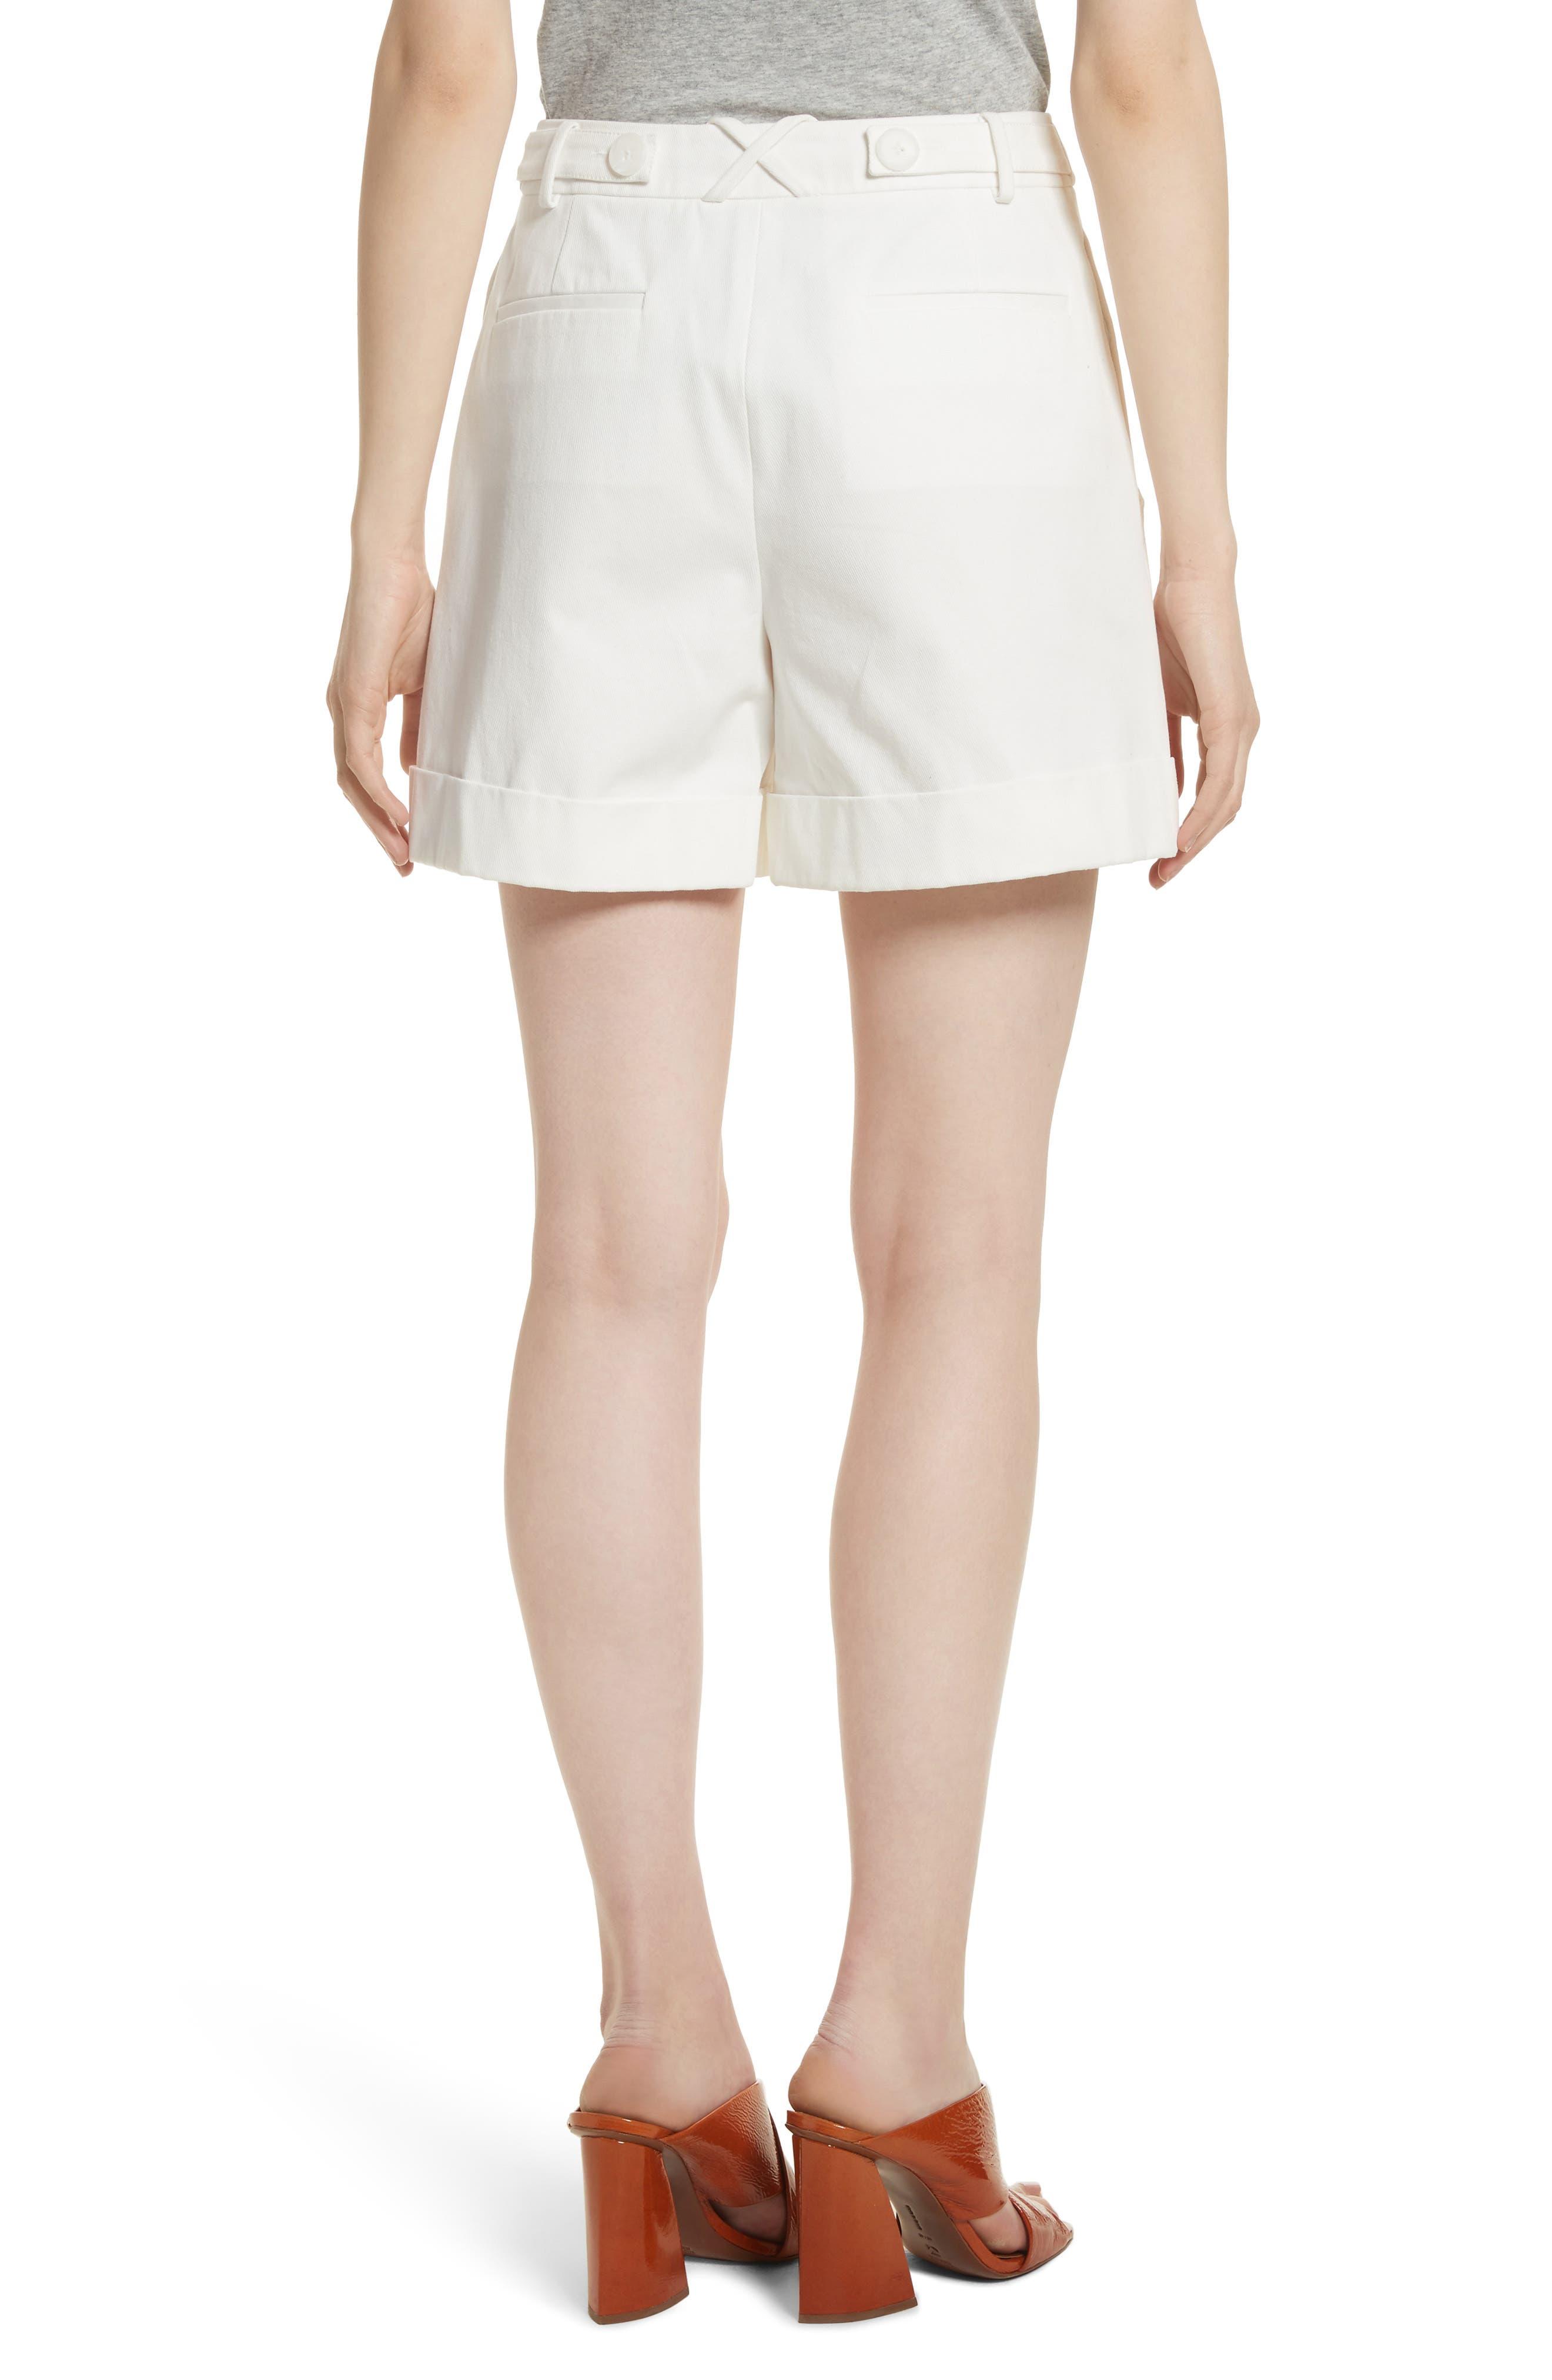 GREY Jason Wu Stretch Cotton Sailor Shorts,                             Alternate thumbnail 2, color,                             110